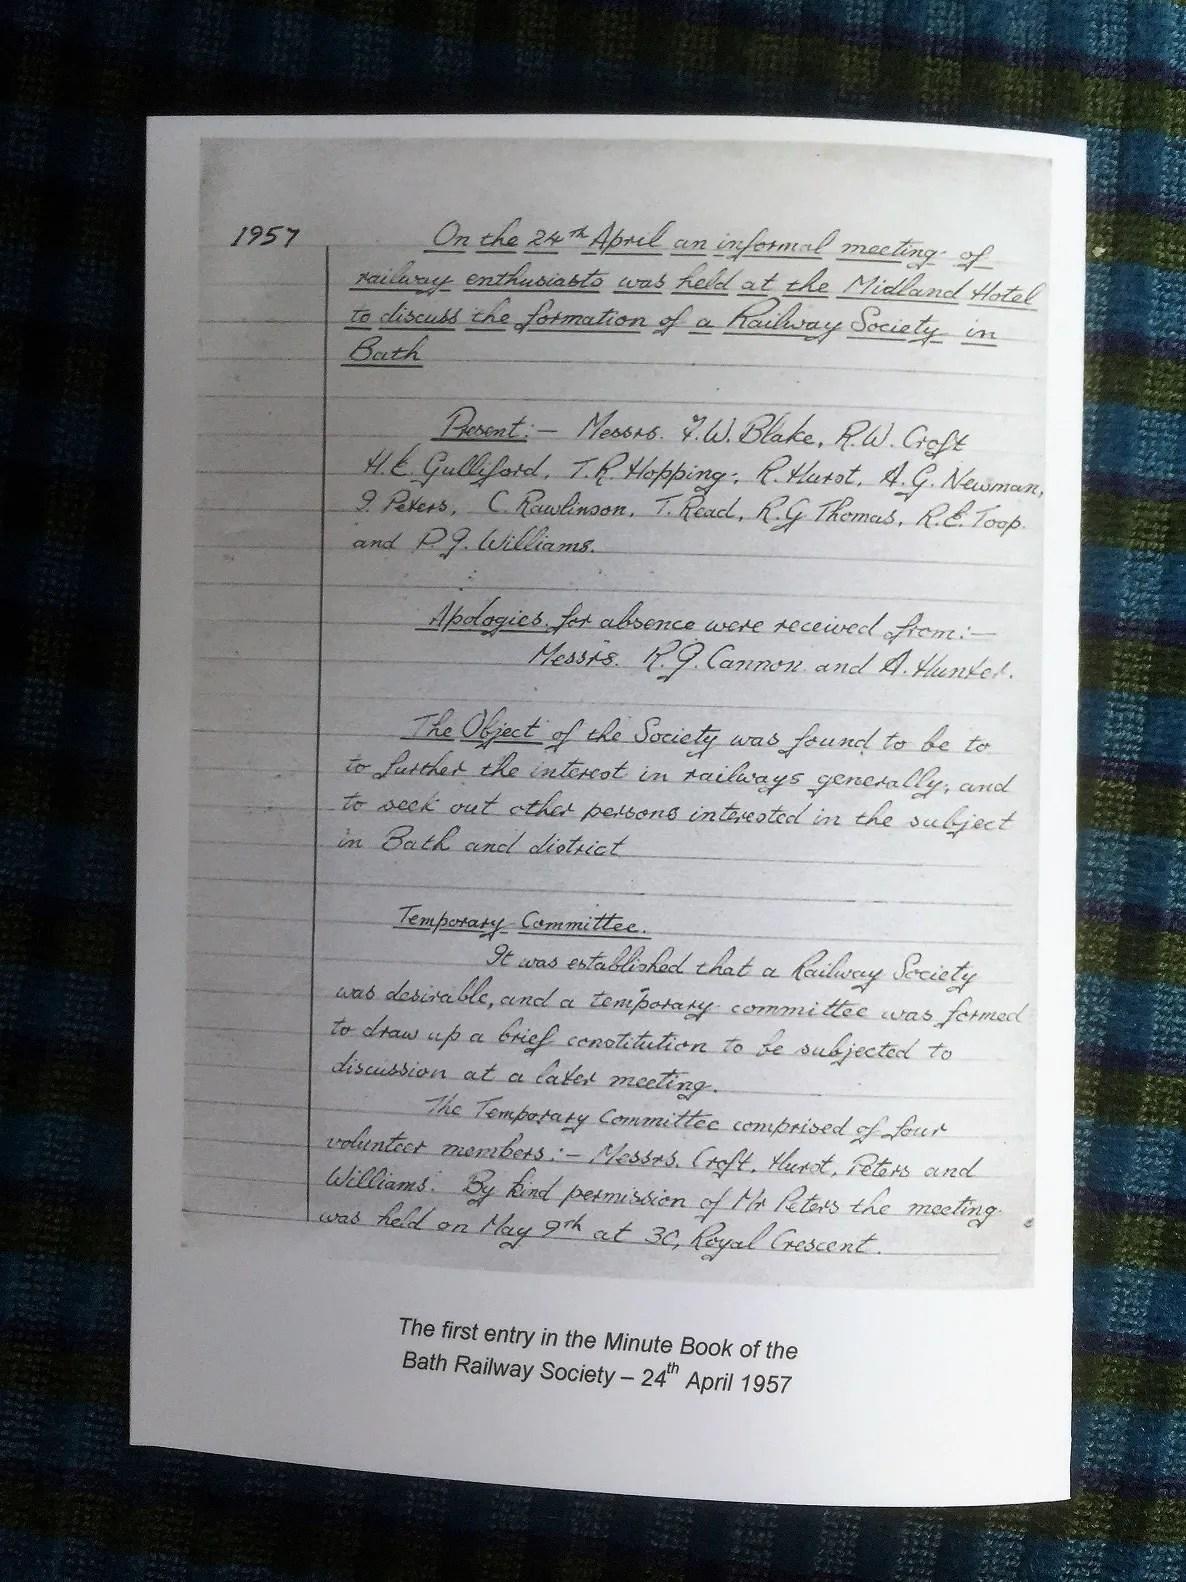 Bath Railway Society minute book 24th April 1957